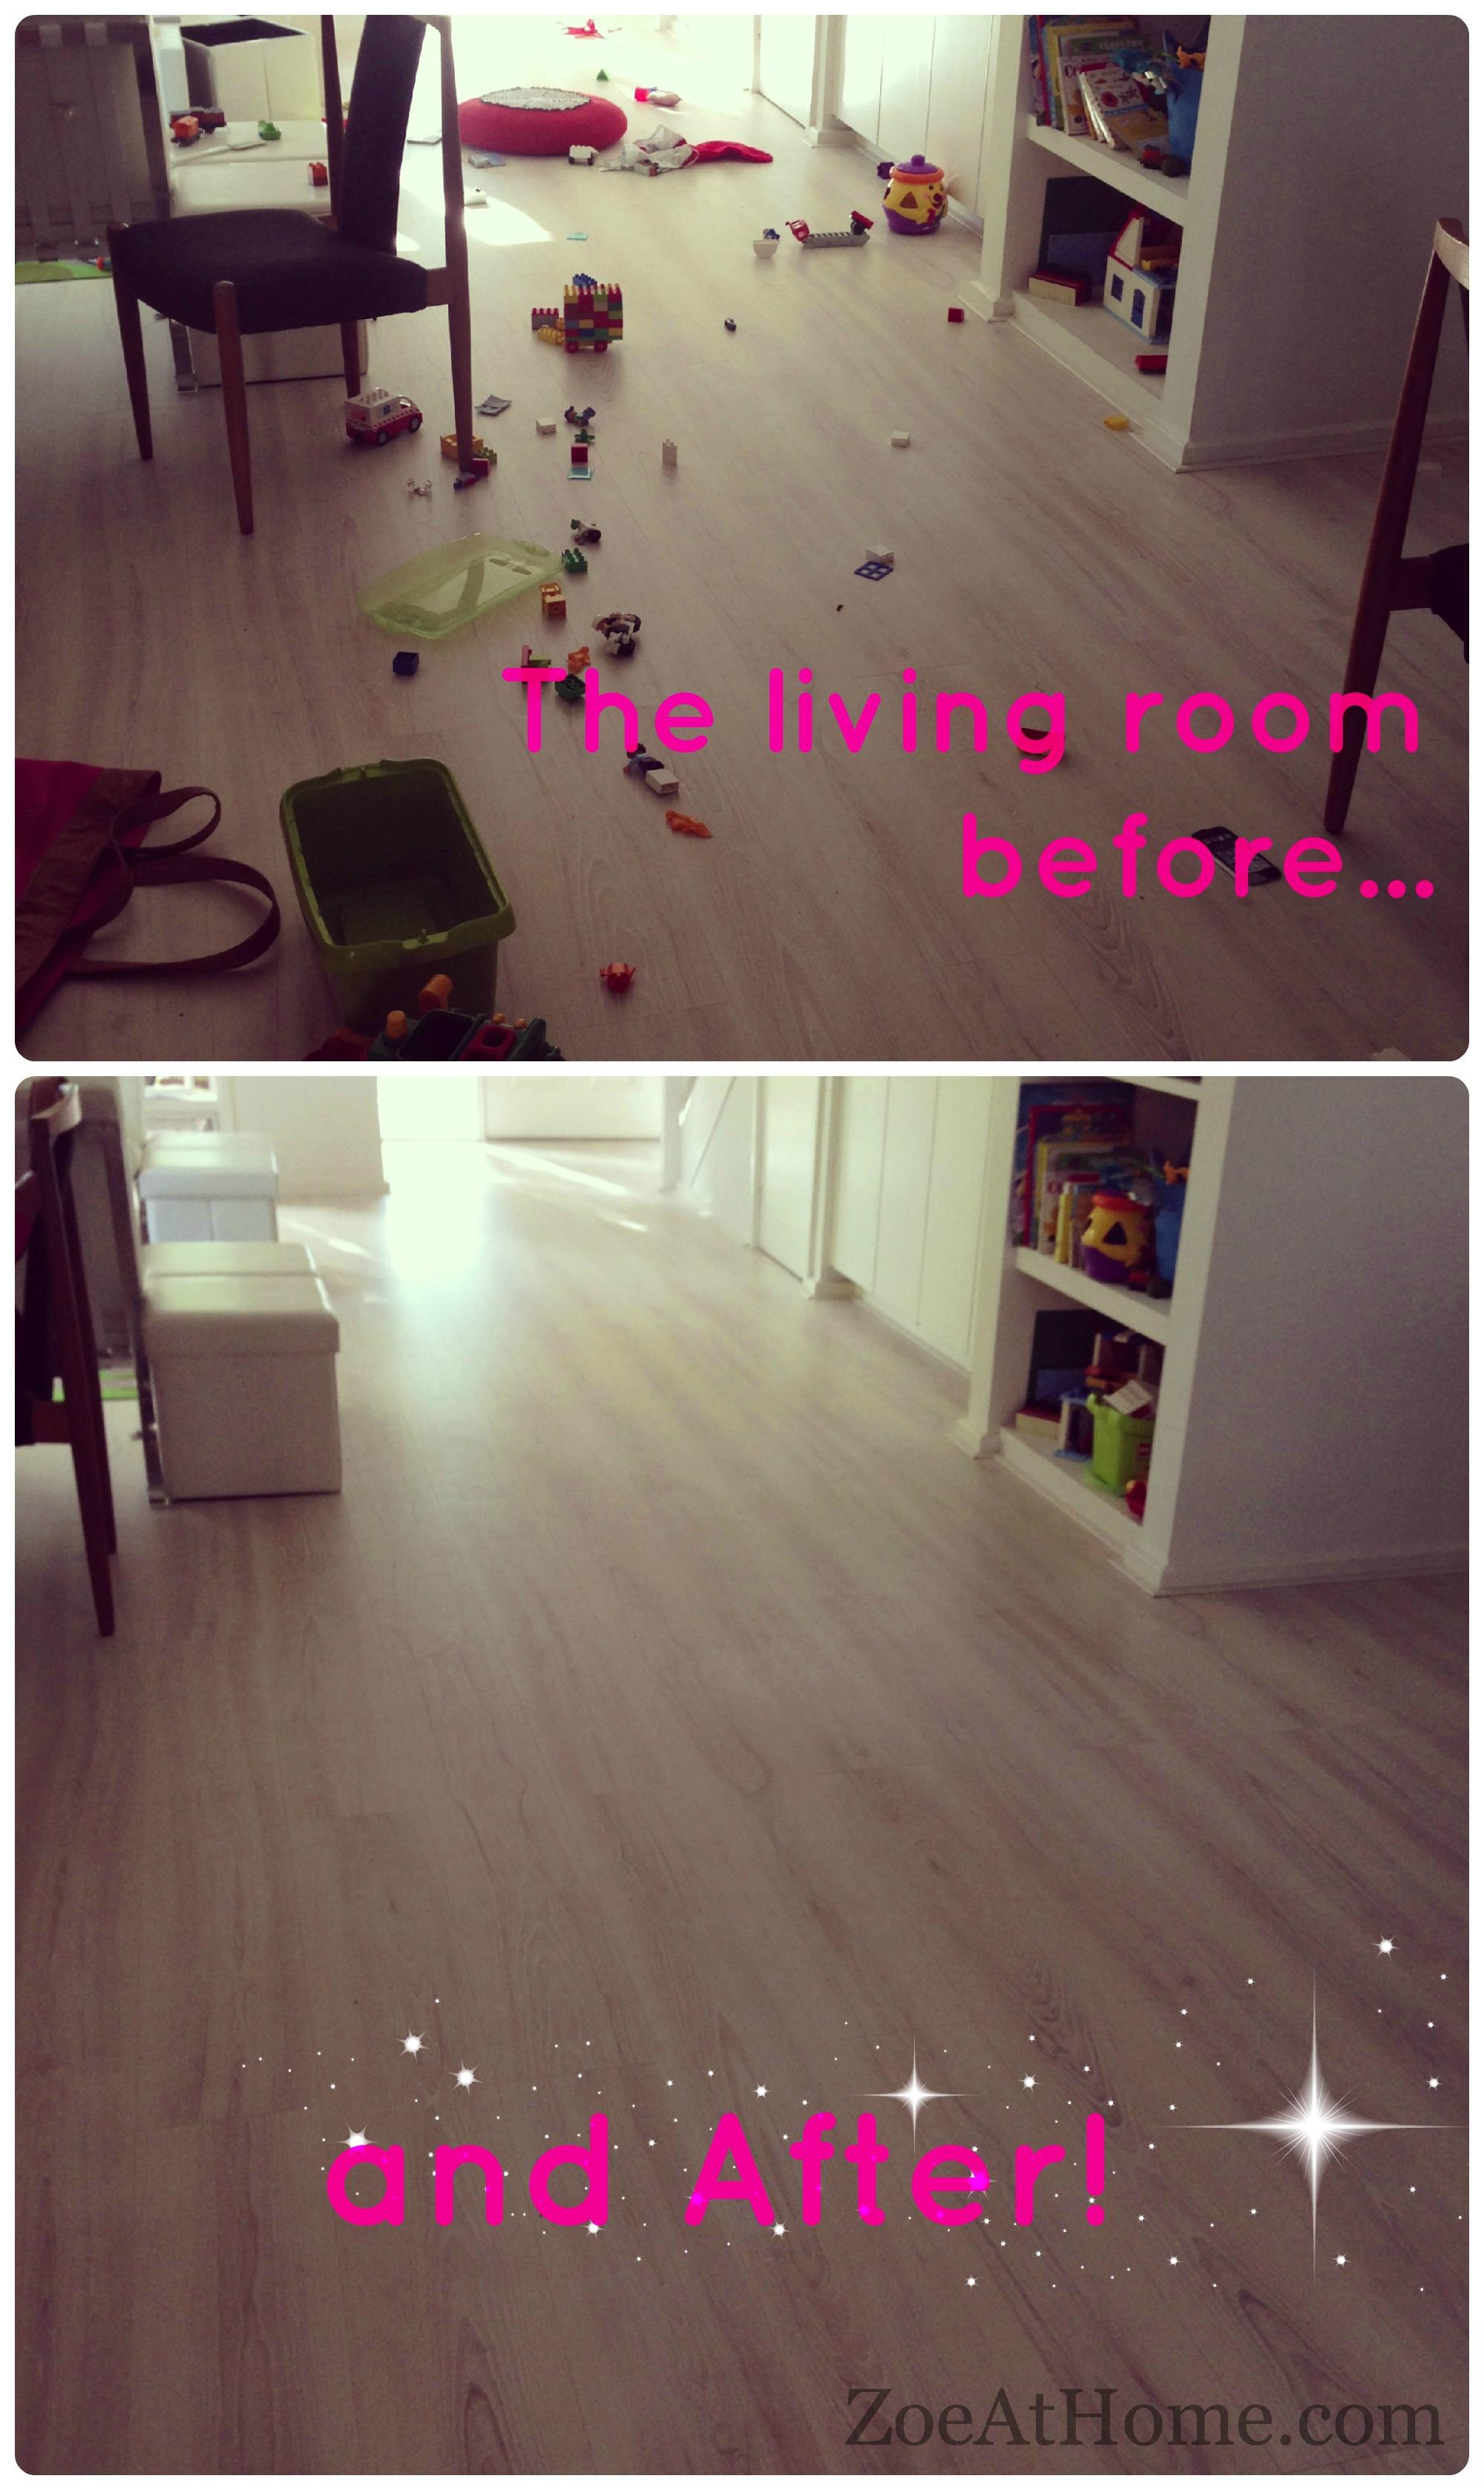 Kids And Clutter Declutter Living Room Zoeathome Declutter Living Room Before And After